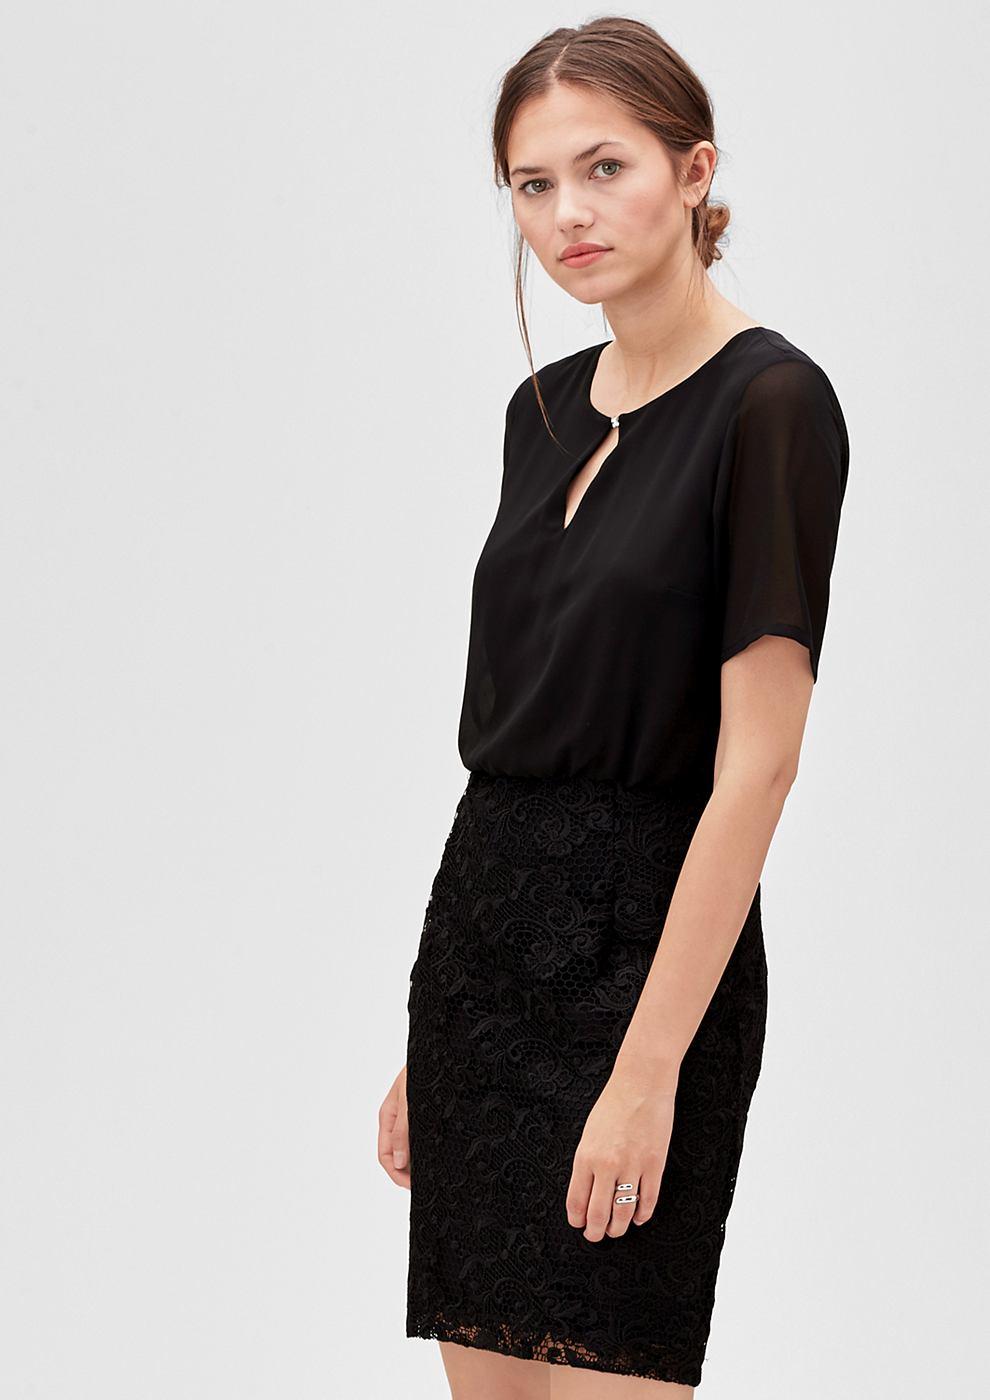 s.Oliver Premium 2-in-1 jurk van chiffon en kant zwart